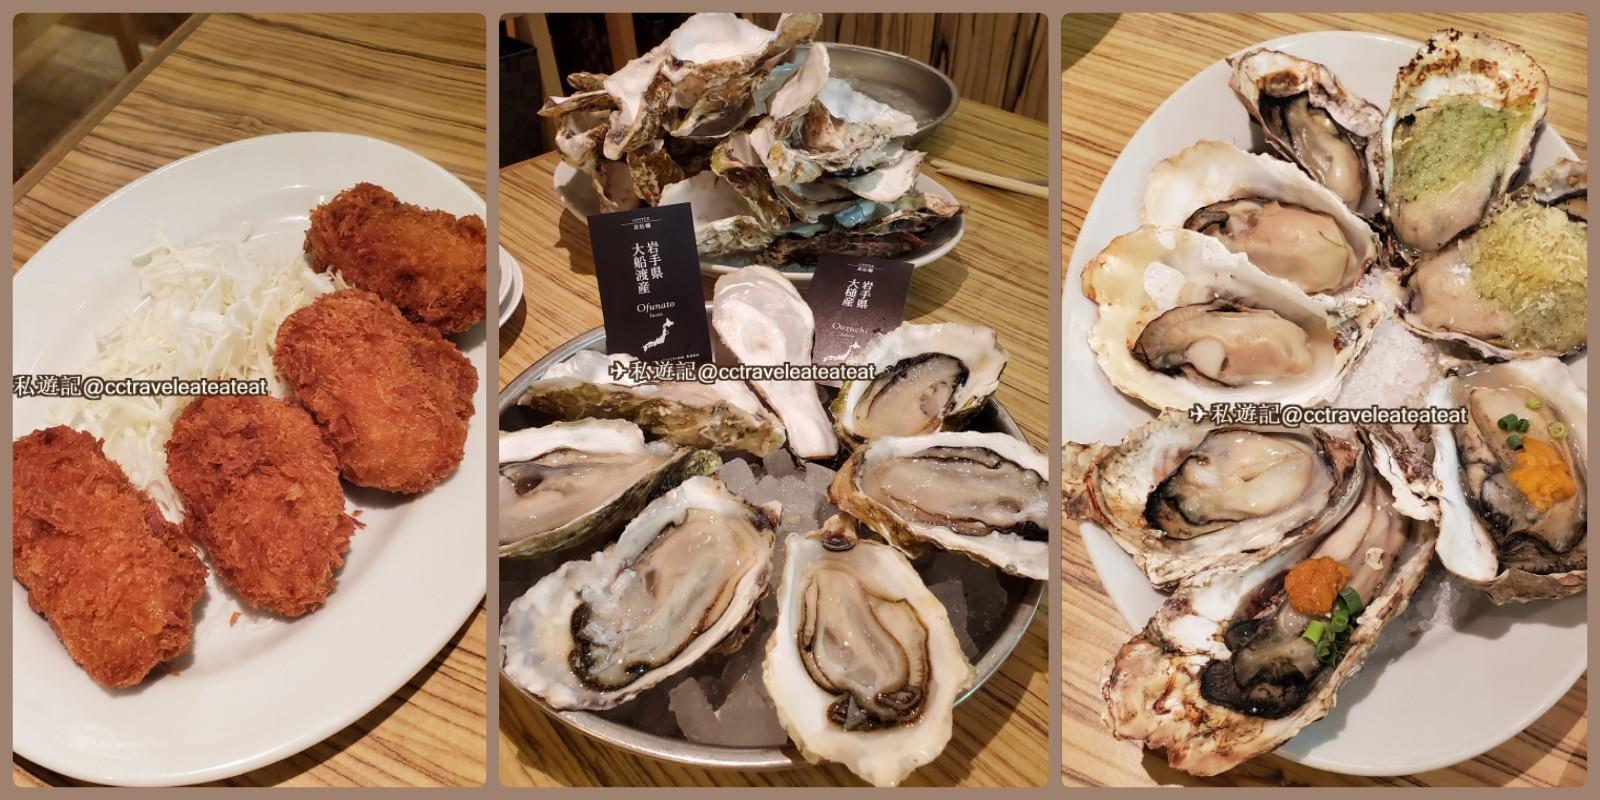 壯大 日本 料理 新宿 - 食べ放題